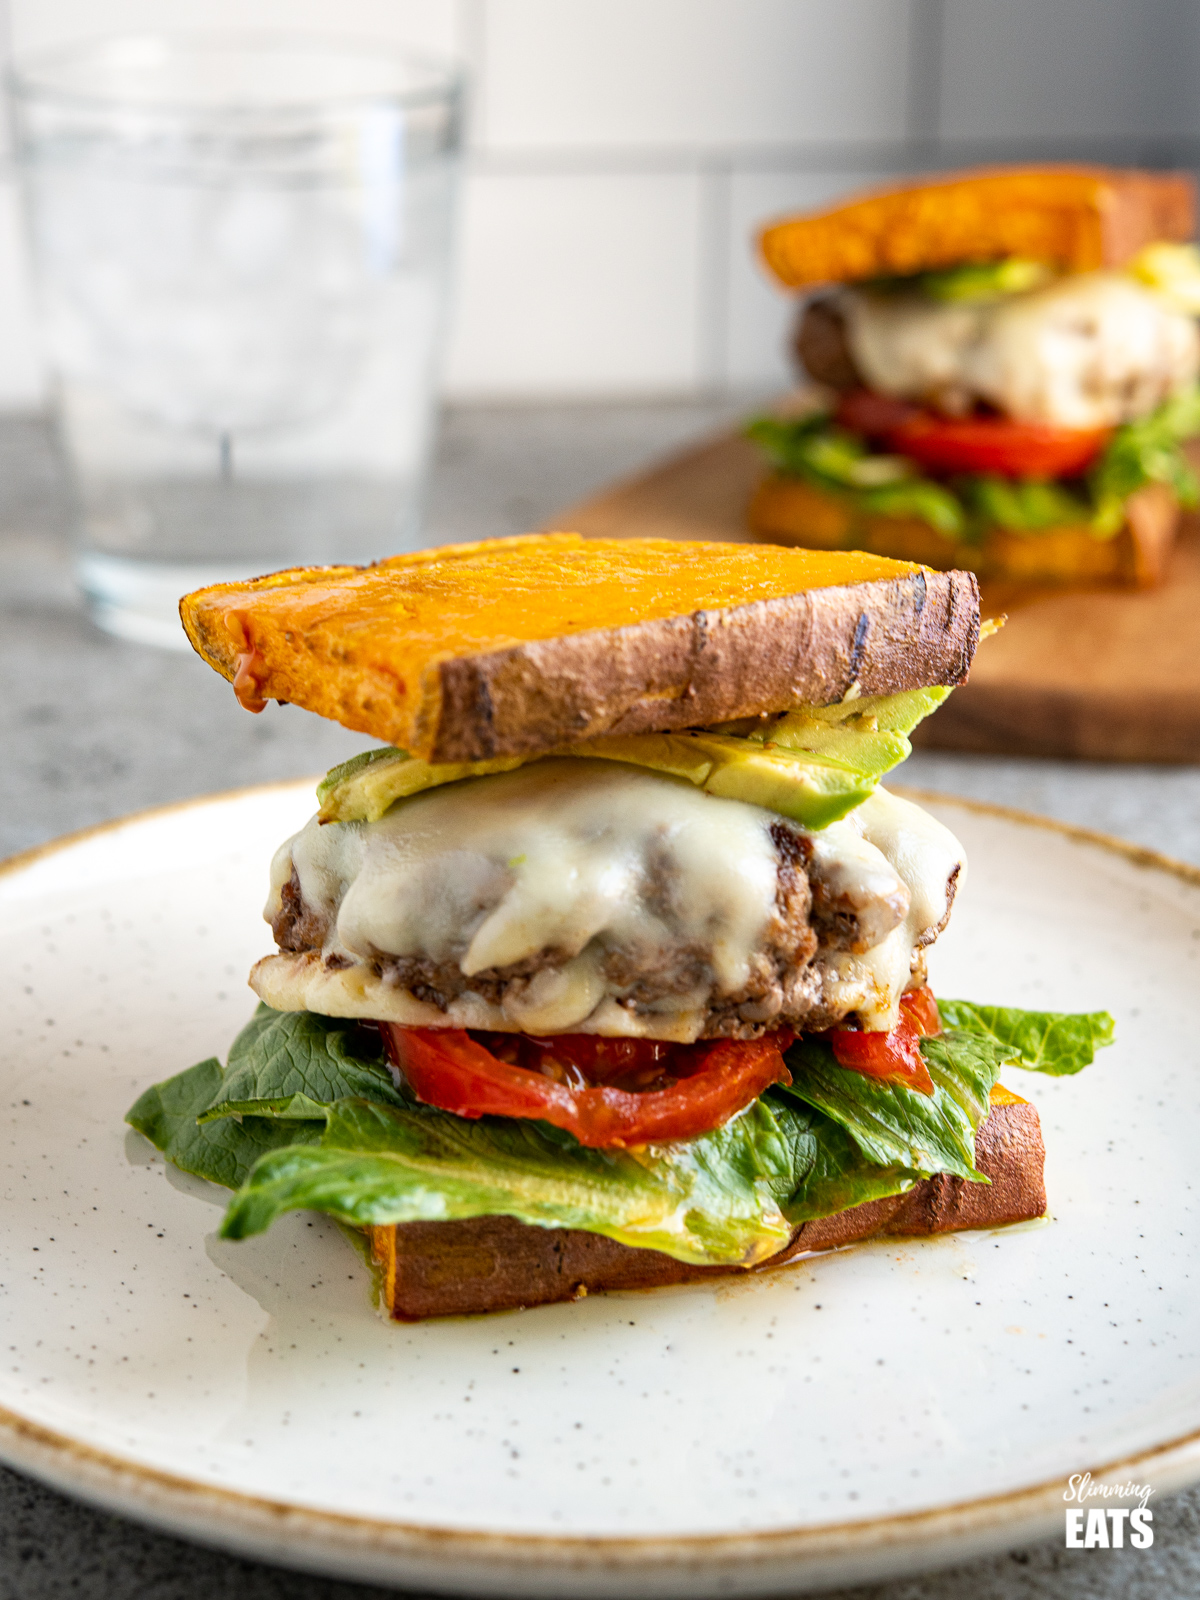 sweet potato burger sliders on a wooden board with tomato, lettuce, mozzerella, avocado and pesto on a white plate